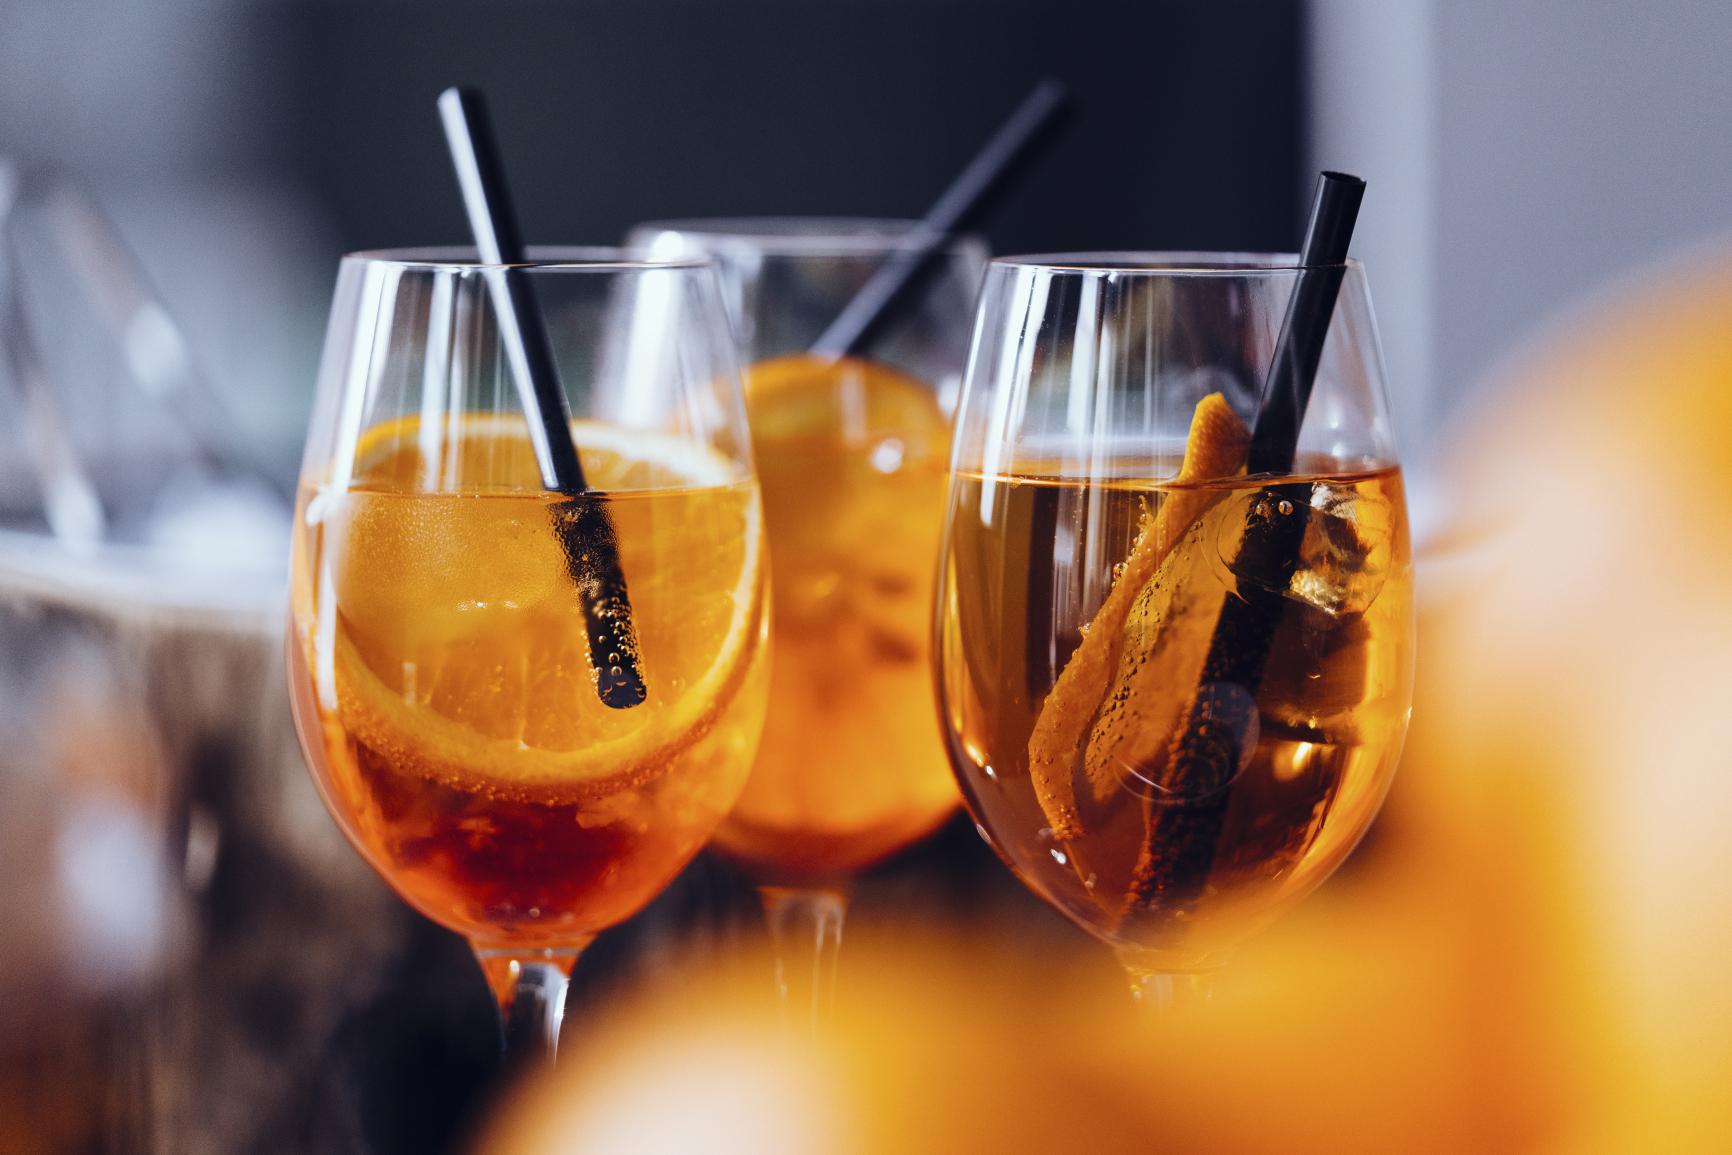 Whiskey aperitif